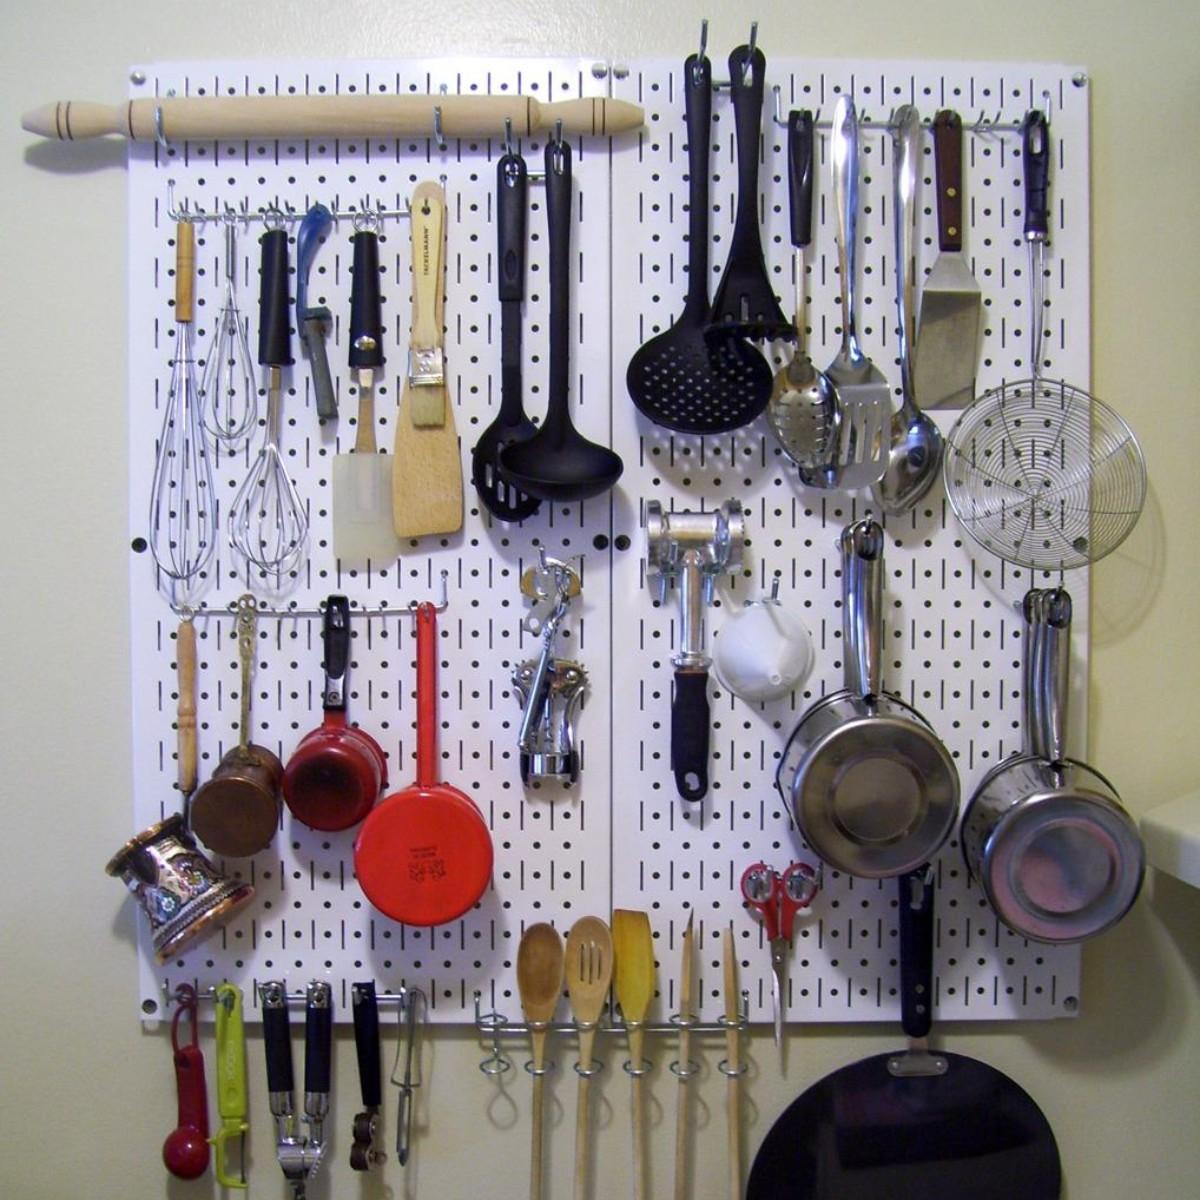 kitchen utensils hanging on white pegboard